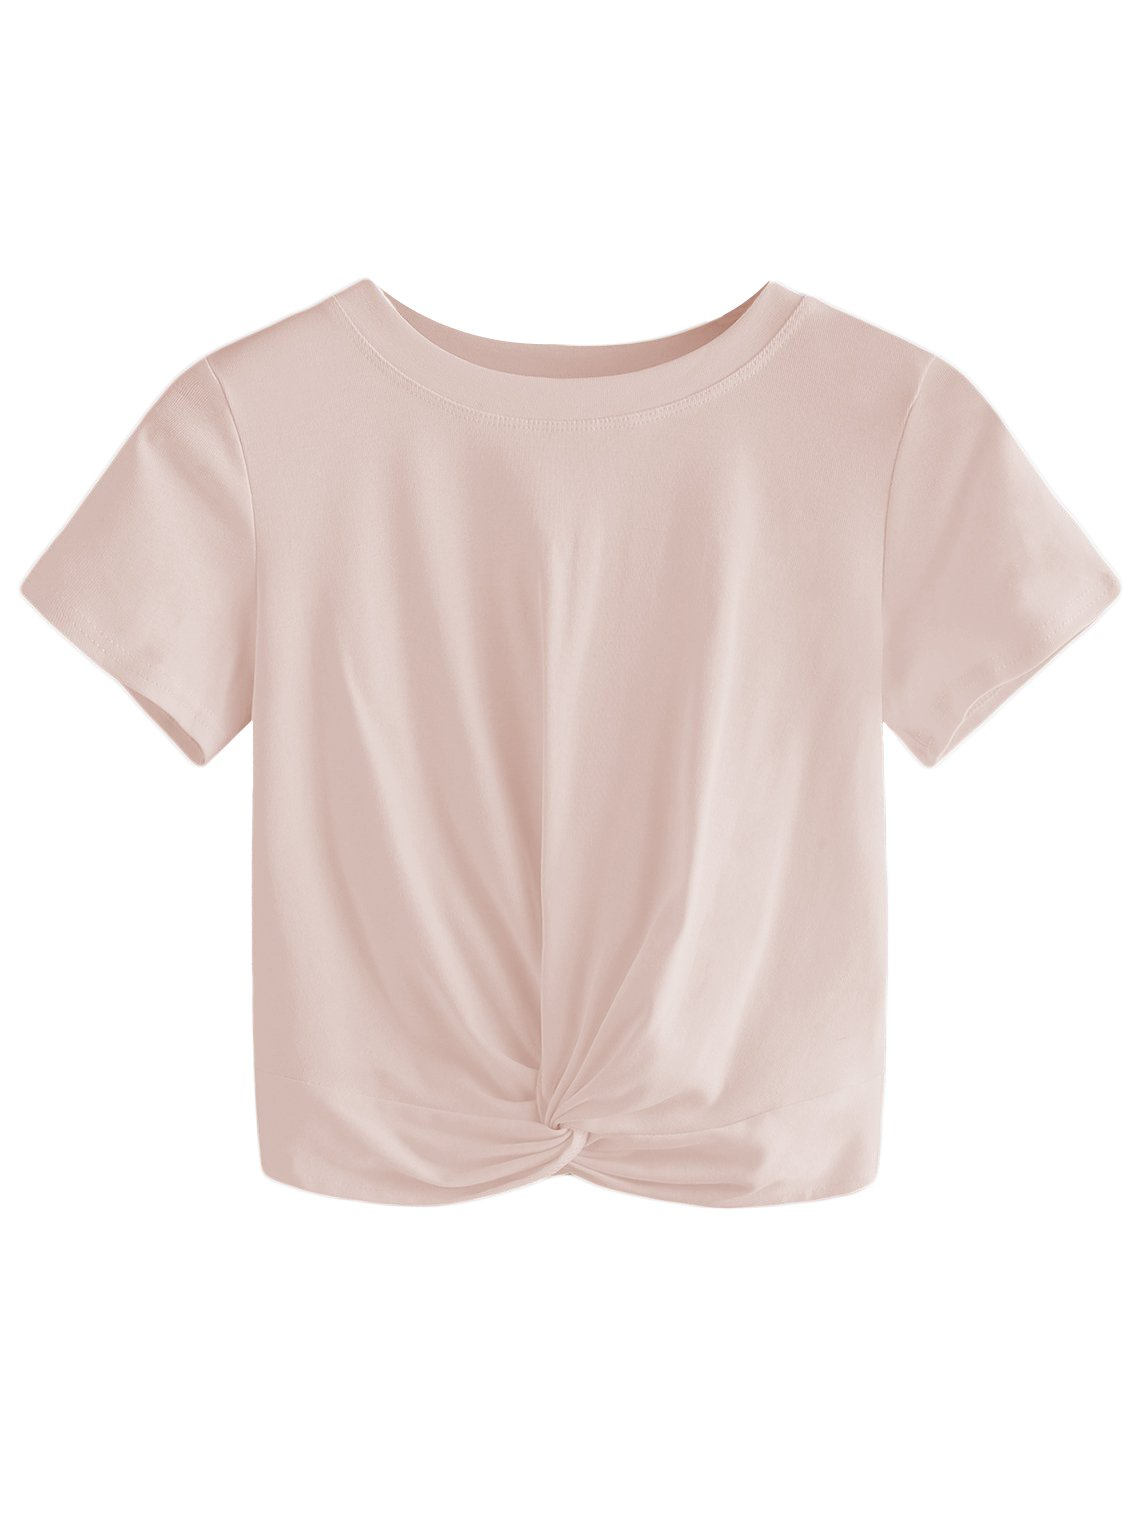 MakeMeChic Women's Summer Crop Top Solid Short Sleeve Twist Front Tee T-Shirt